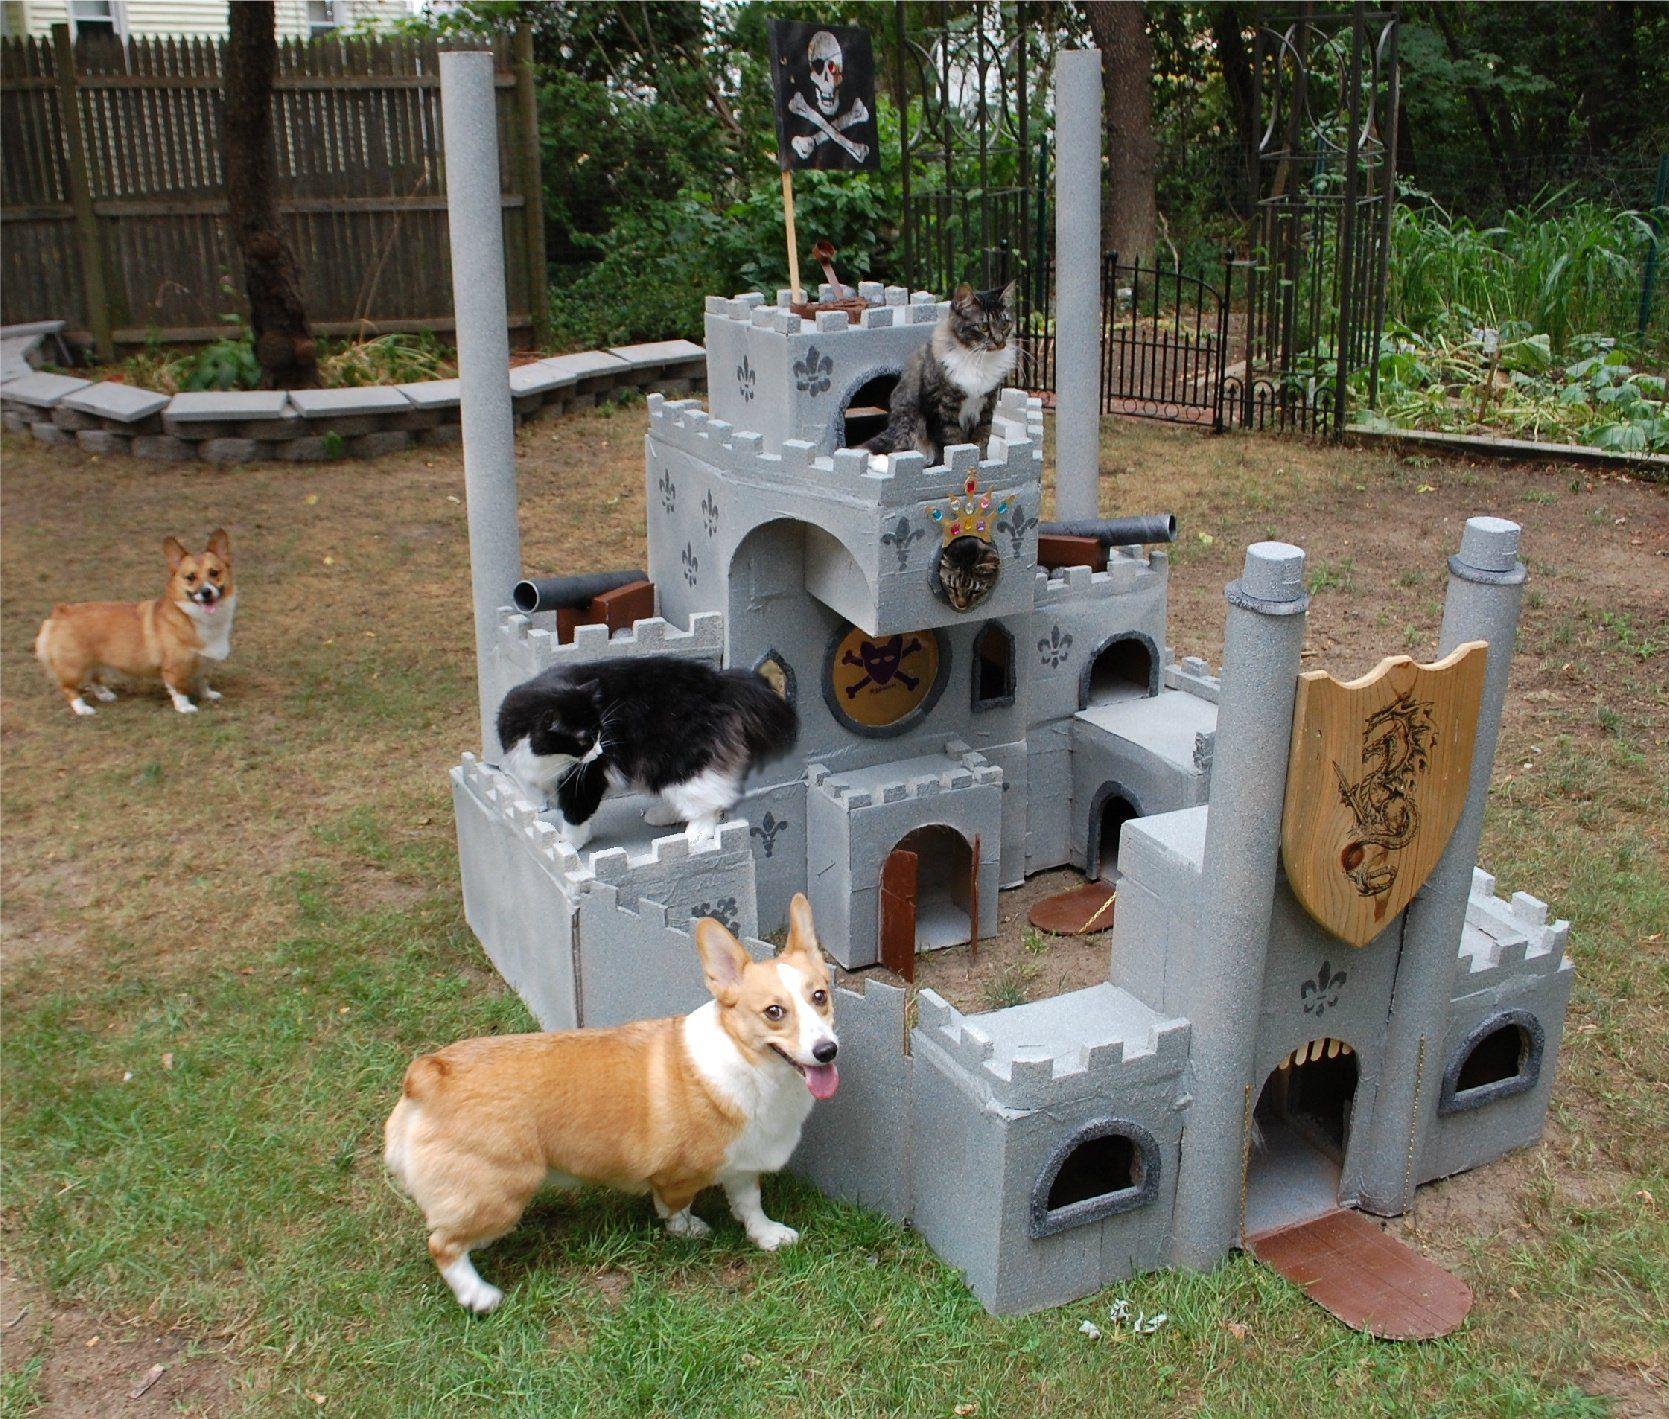 Corgi Cat Castle Aka Corgi Summer Fort Animals Funny Animals Funny Animal Pictures